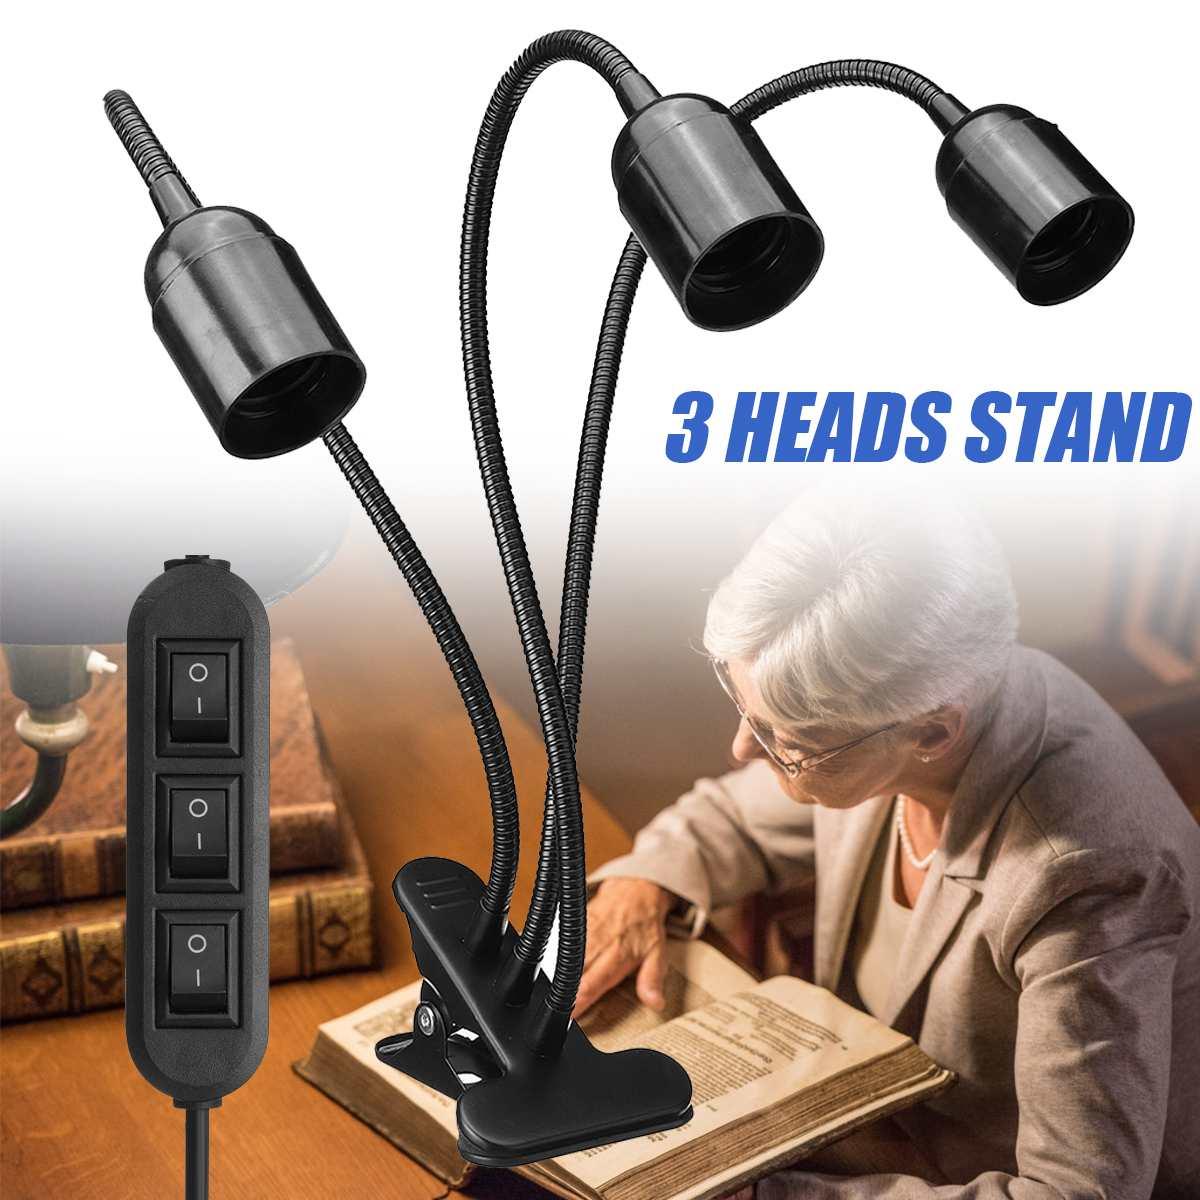 Flexible Plant Growth Light Base Stand 3 Heads Clip-On Desk Light E27 Bulb Stand Holder Kids Study Table Lamp Aquarium Lighting